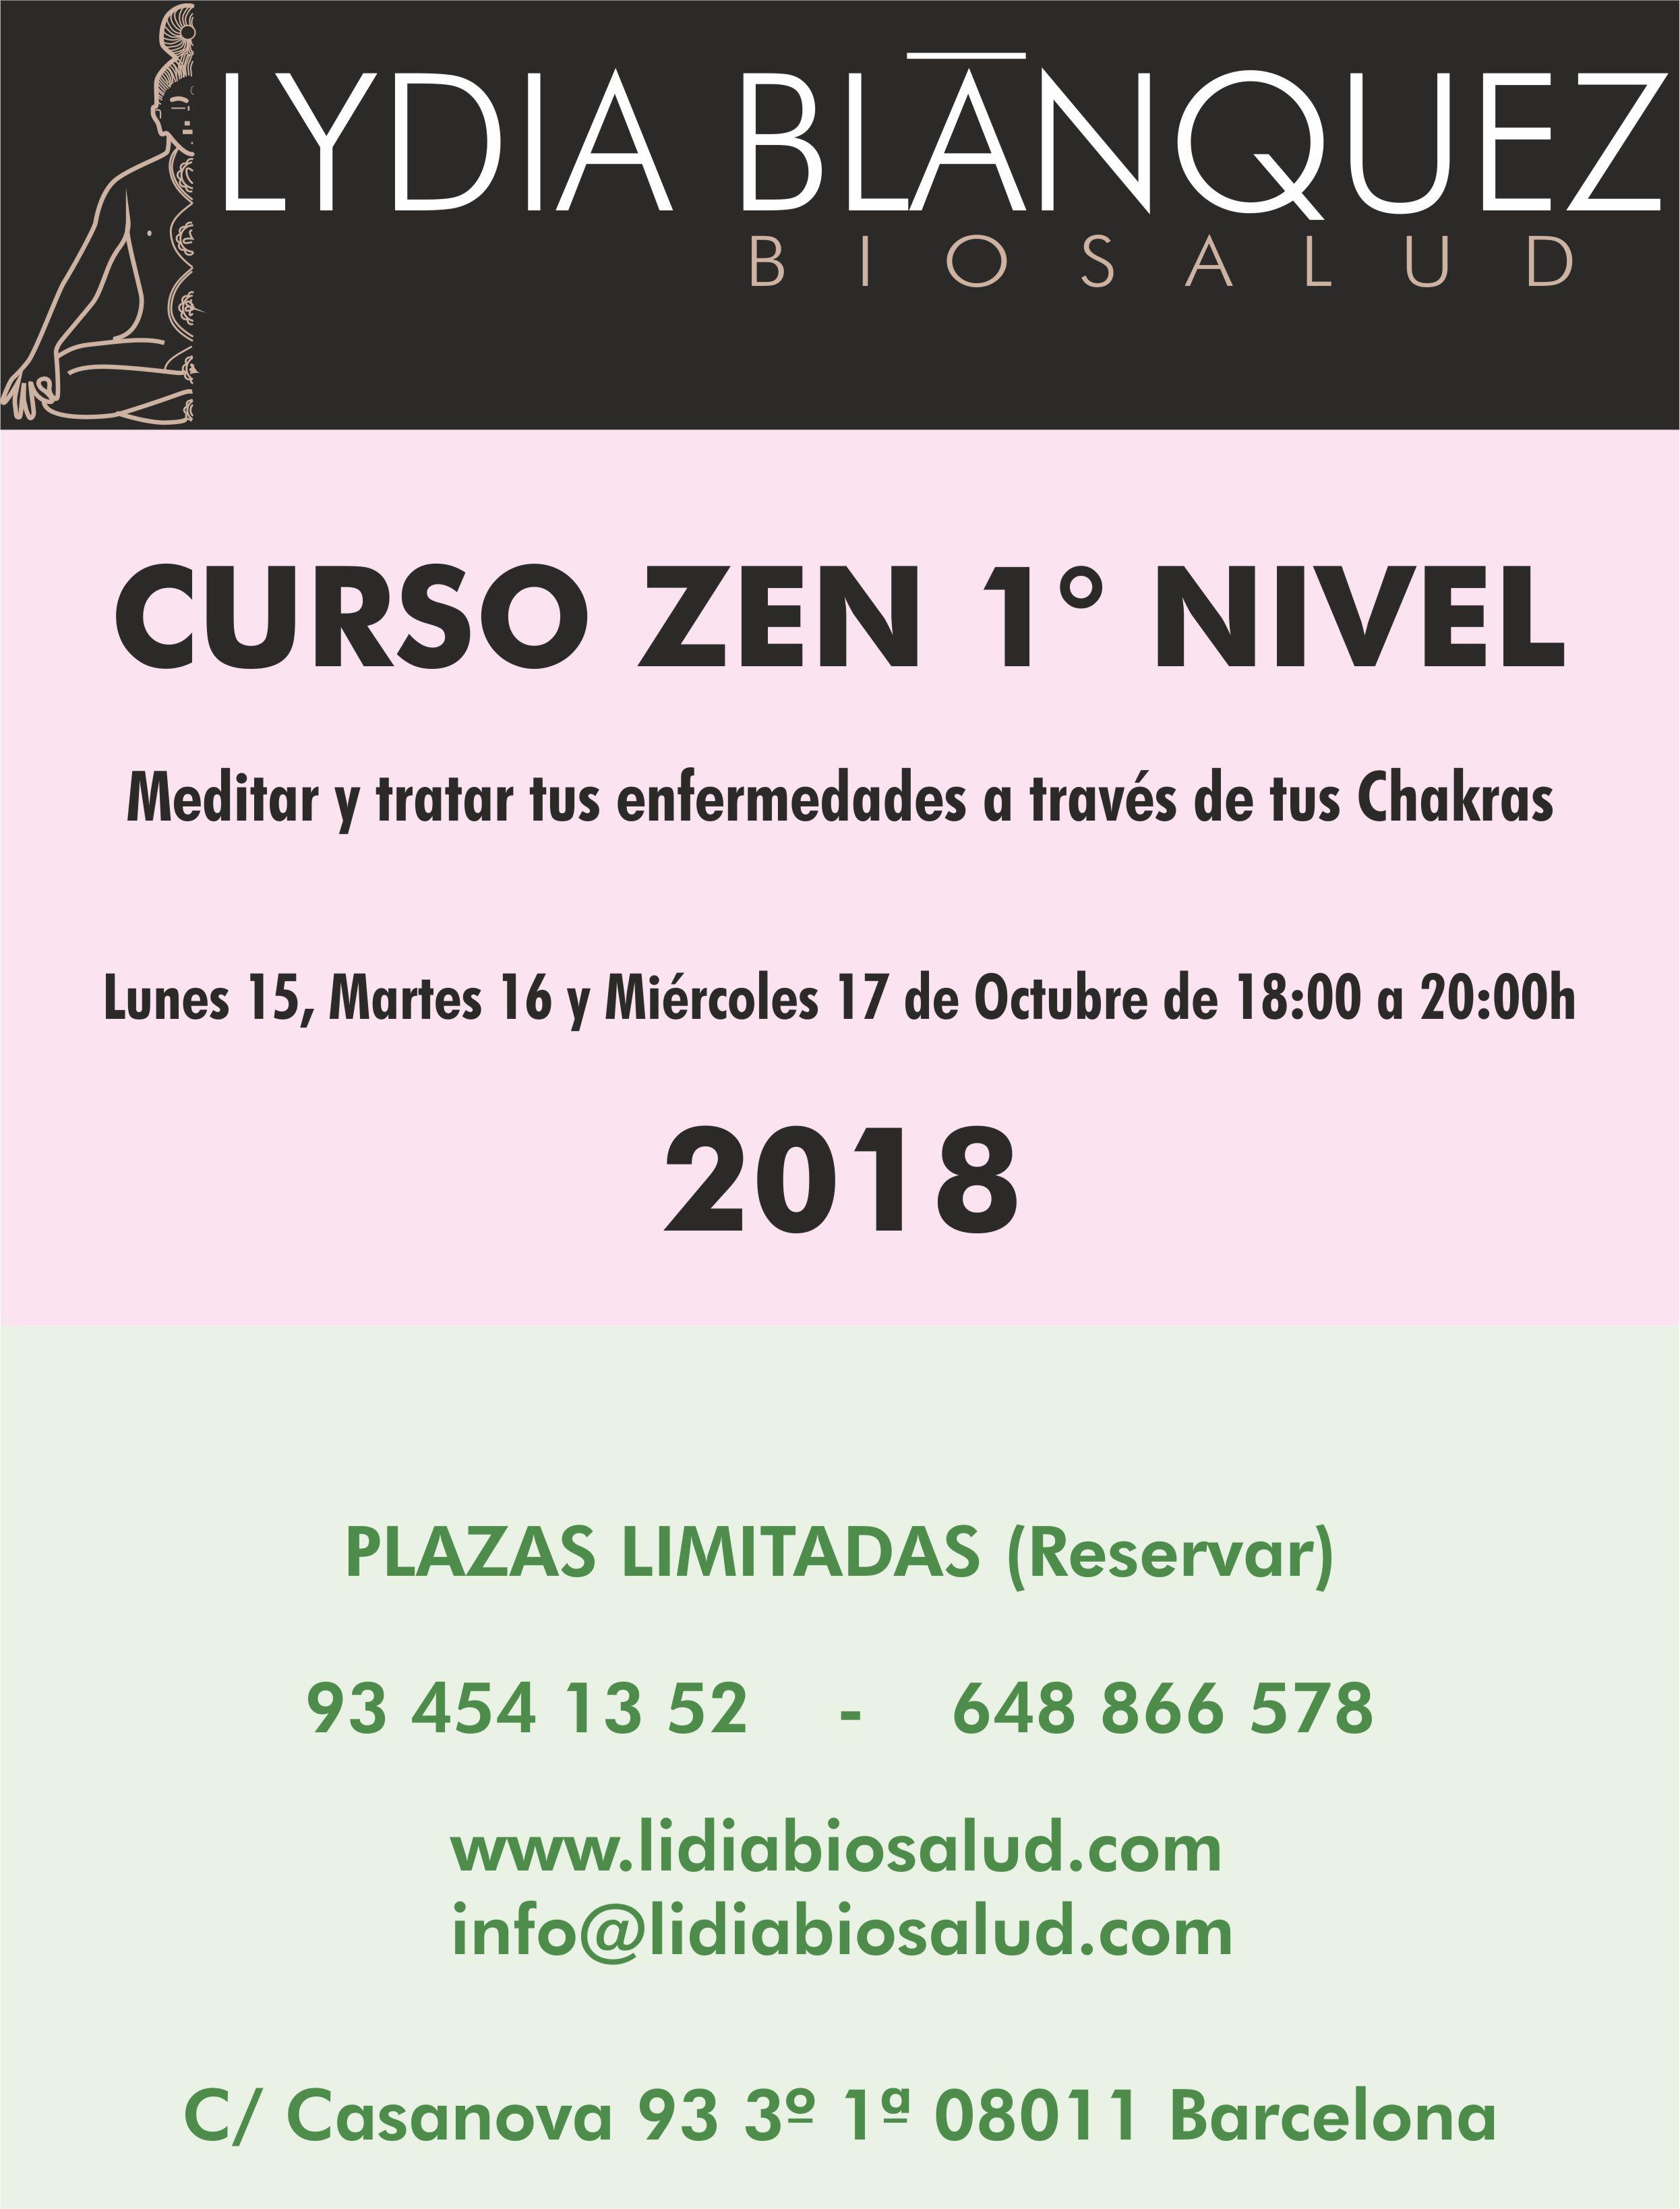 PROXIMO CURSO ZEN OCTUBRE 2018 - Lidia Bio Salud